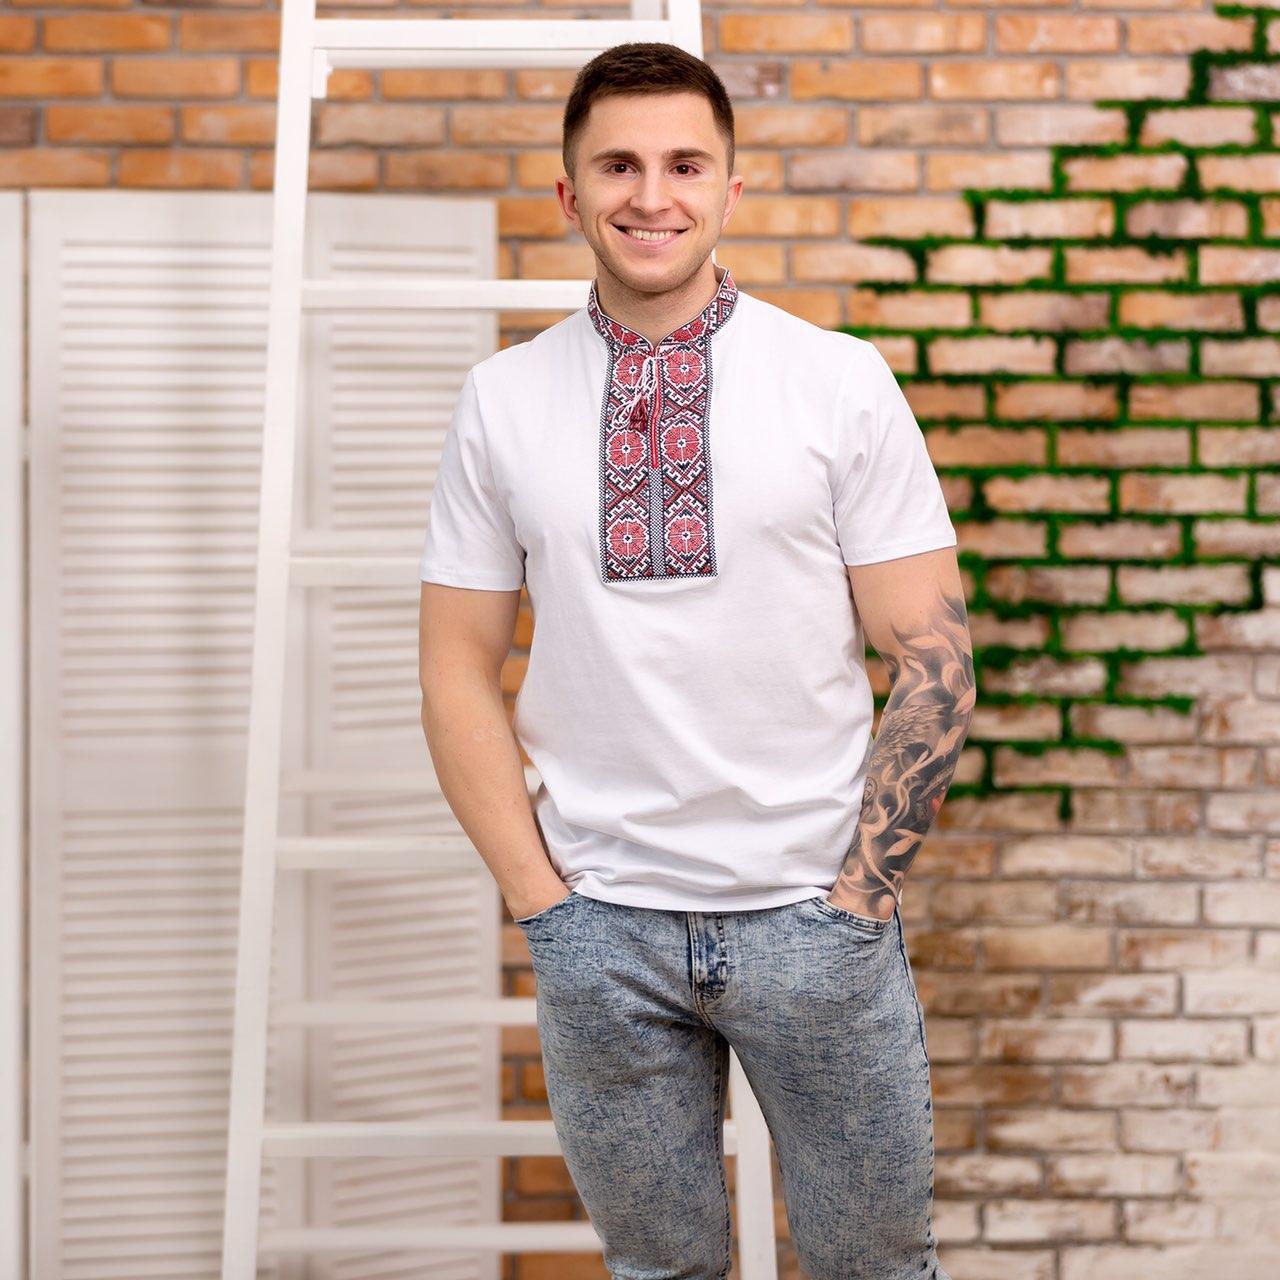 Мужская футболка с орнаментом